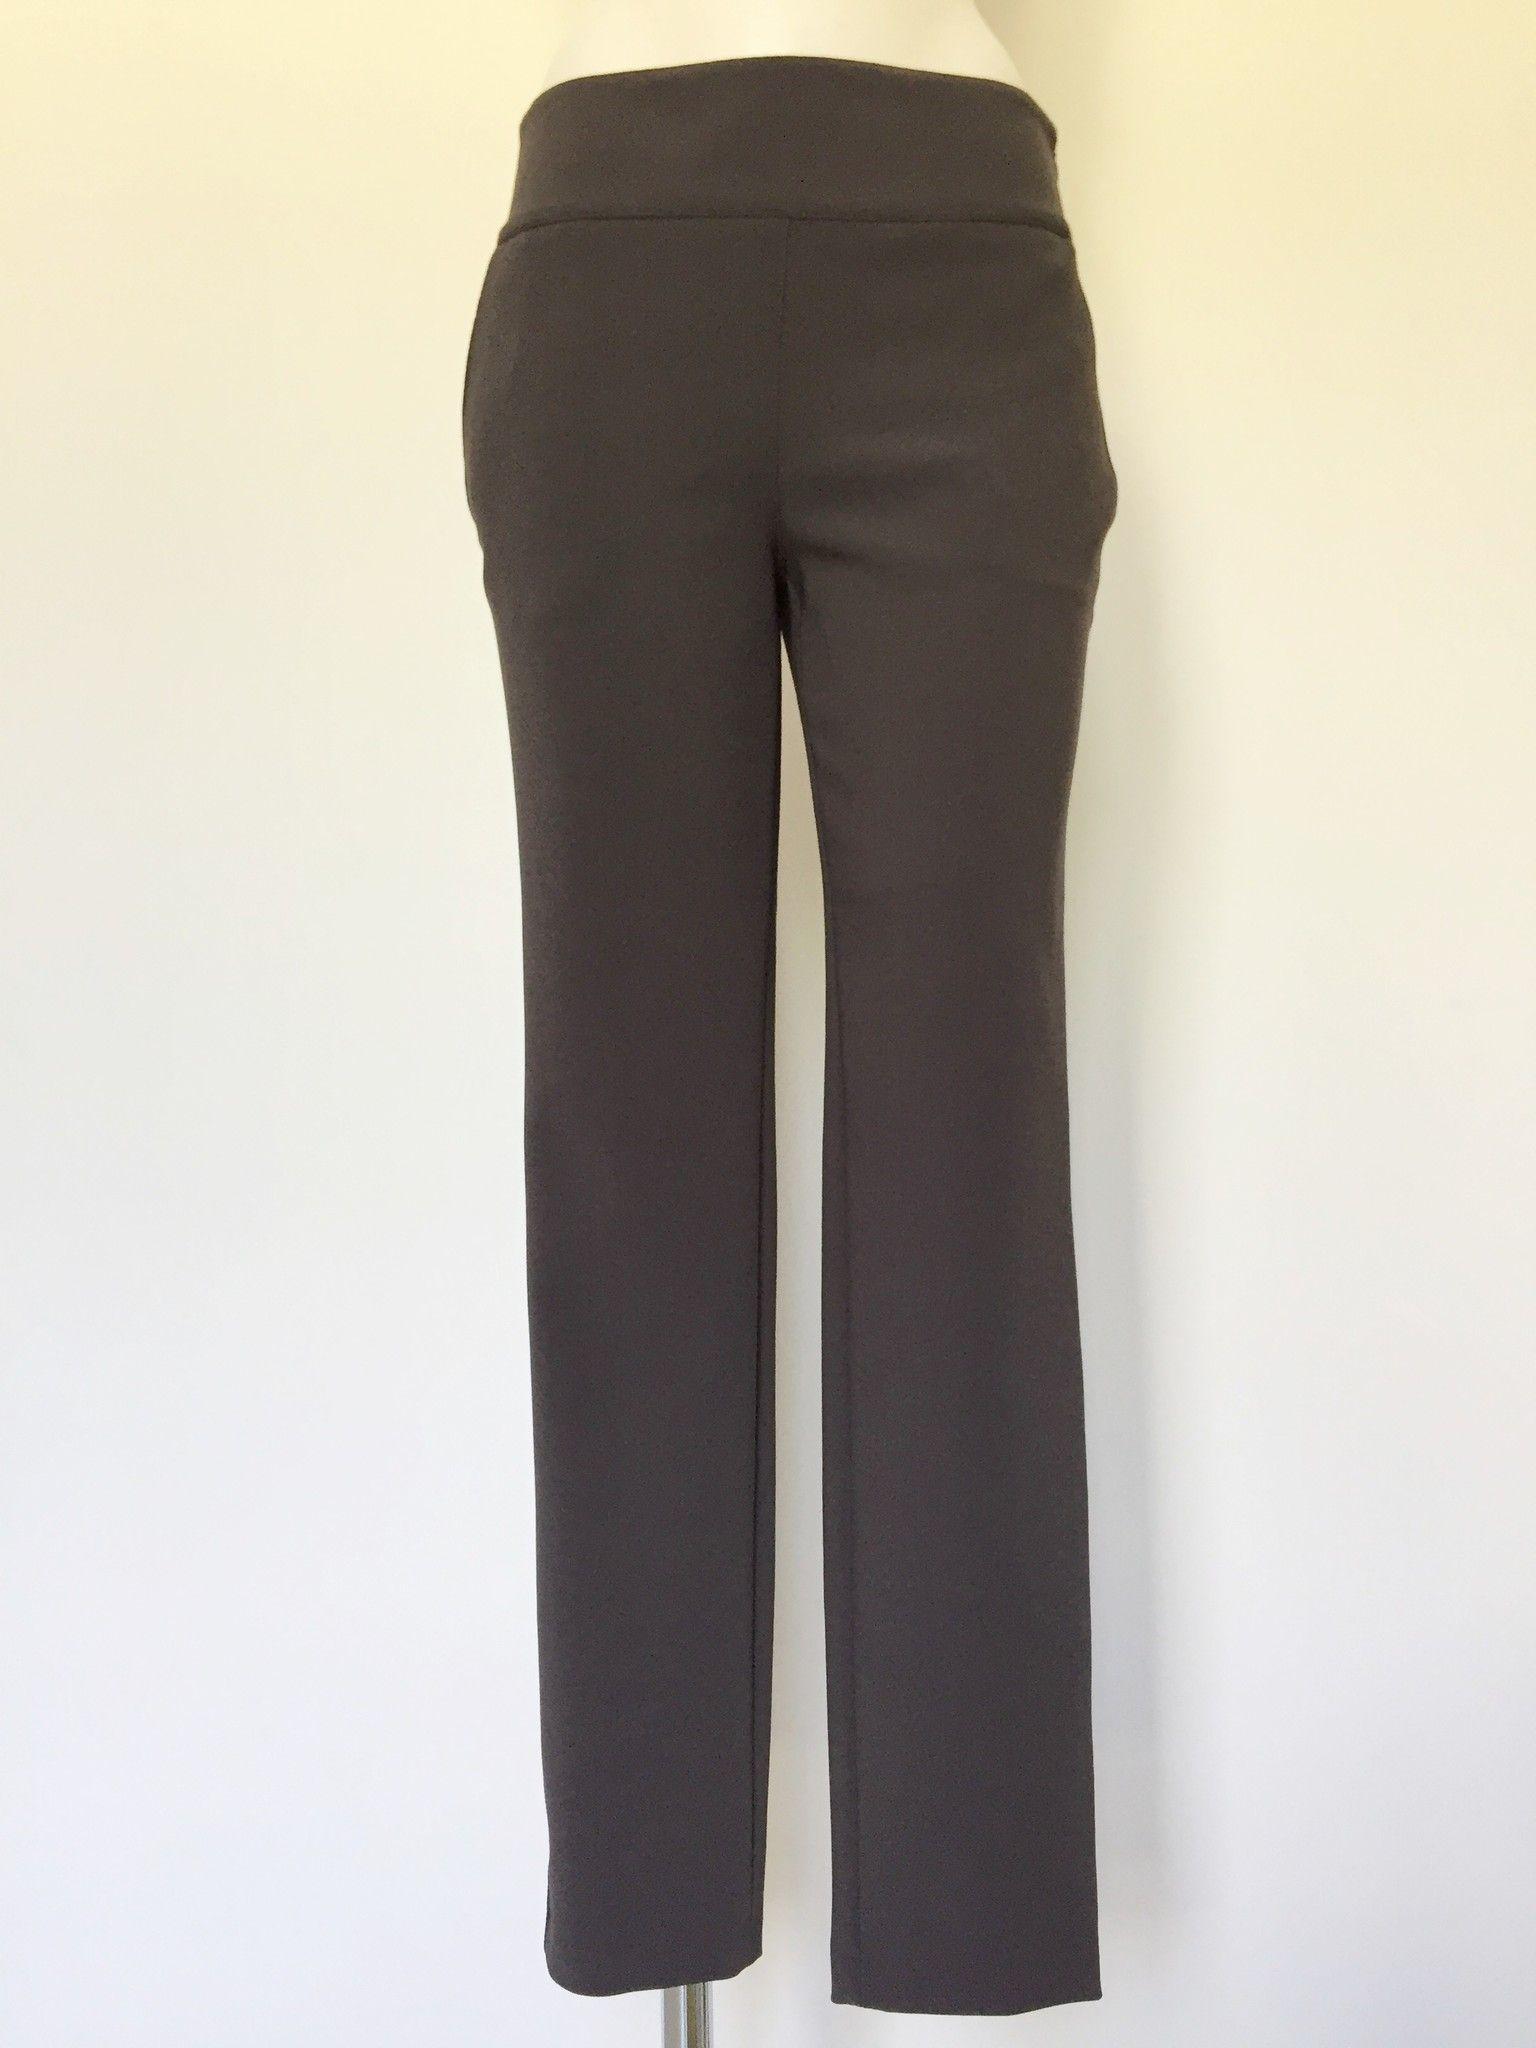 Pantalone Atos Lombardini Lungo Fascia Alta Cod.P04040